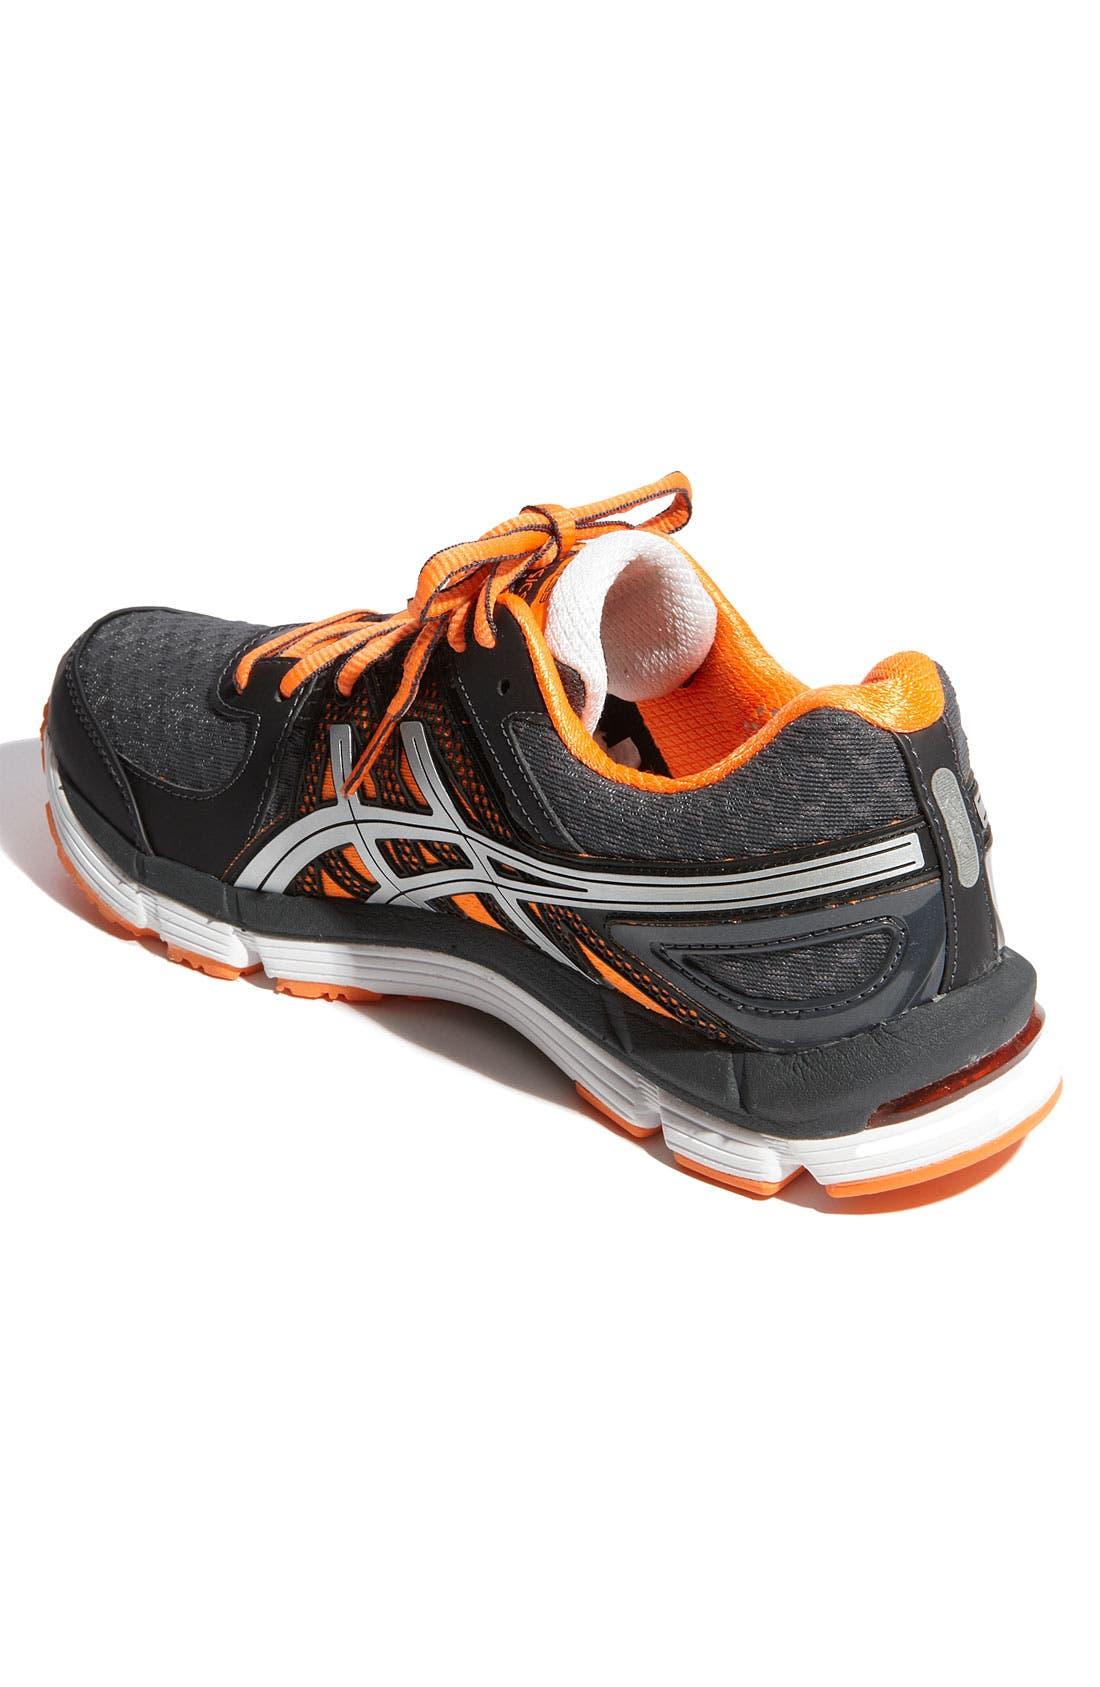 Alternate Image 2  - ASICS® 'GEL-Excel 33' Running Shoe (Men)